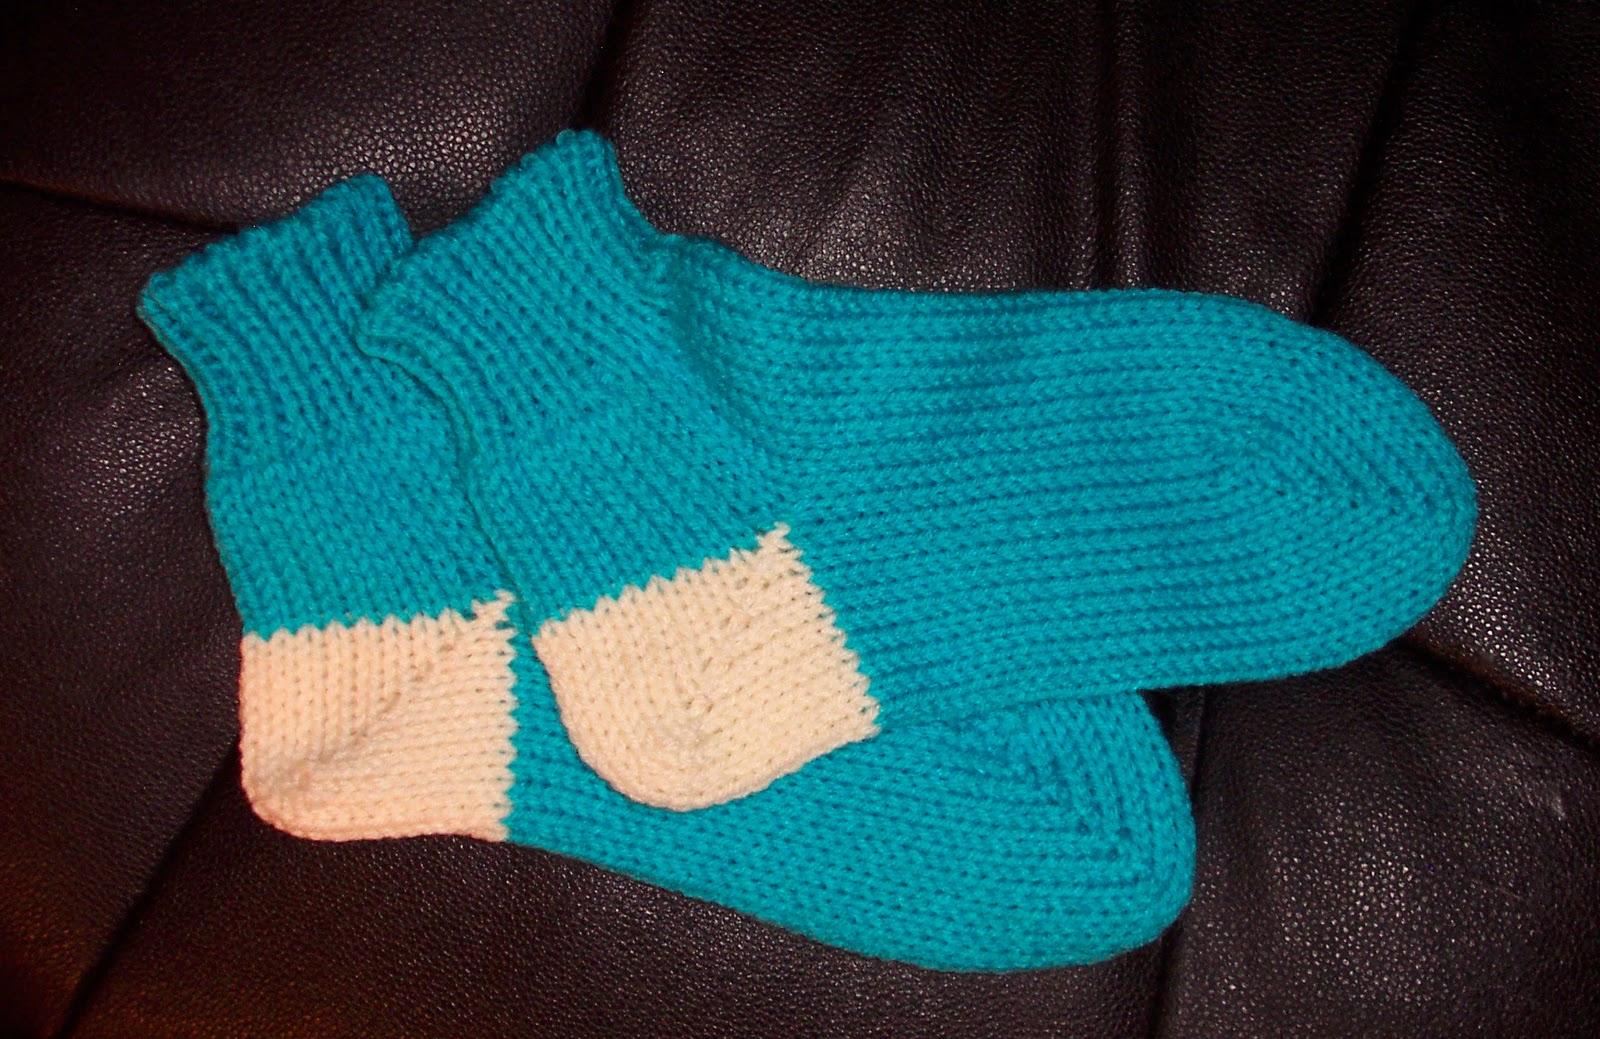 TOM MACHINE KNITTING GUY: Knitted Slipper Socks - Warm ...